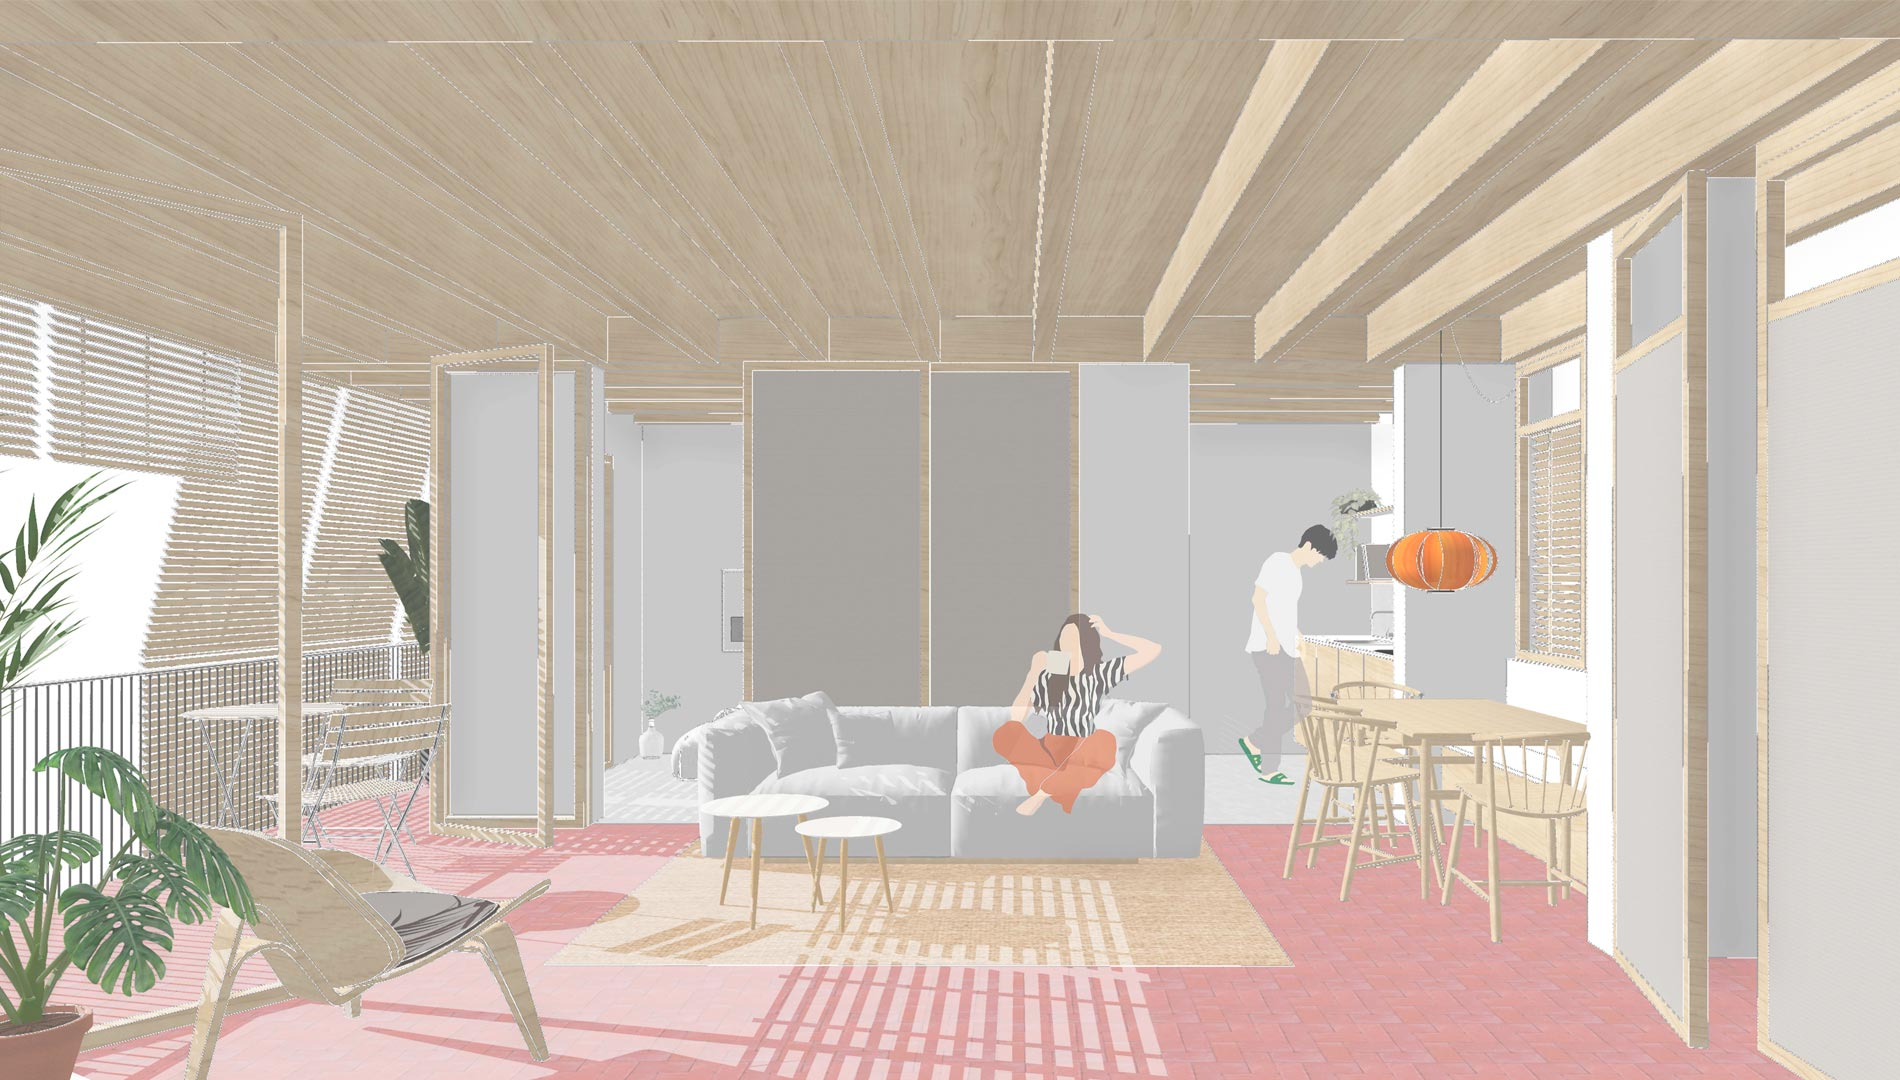 arquitectos-barcelona-edificio-viladecans-mangrana-arquitectes-imatge-portada